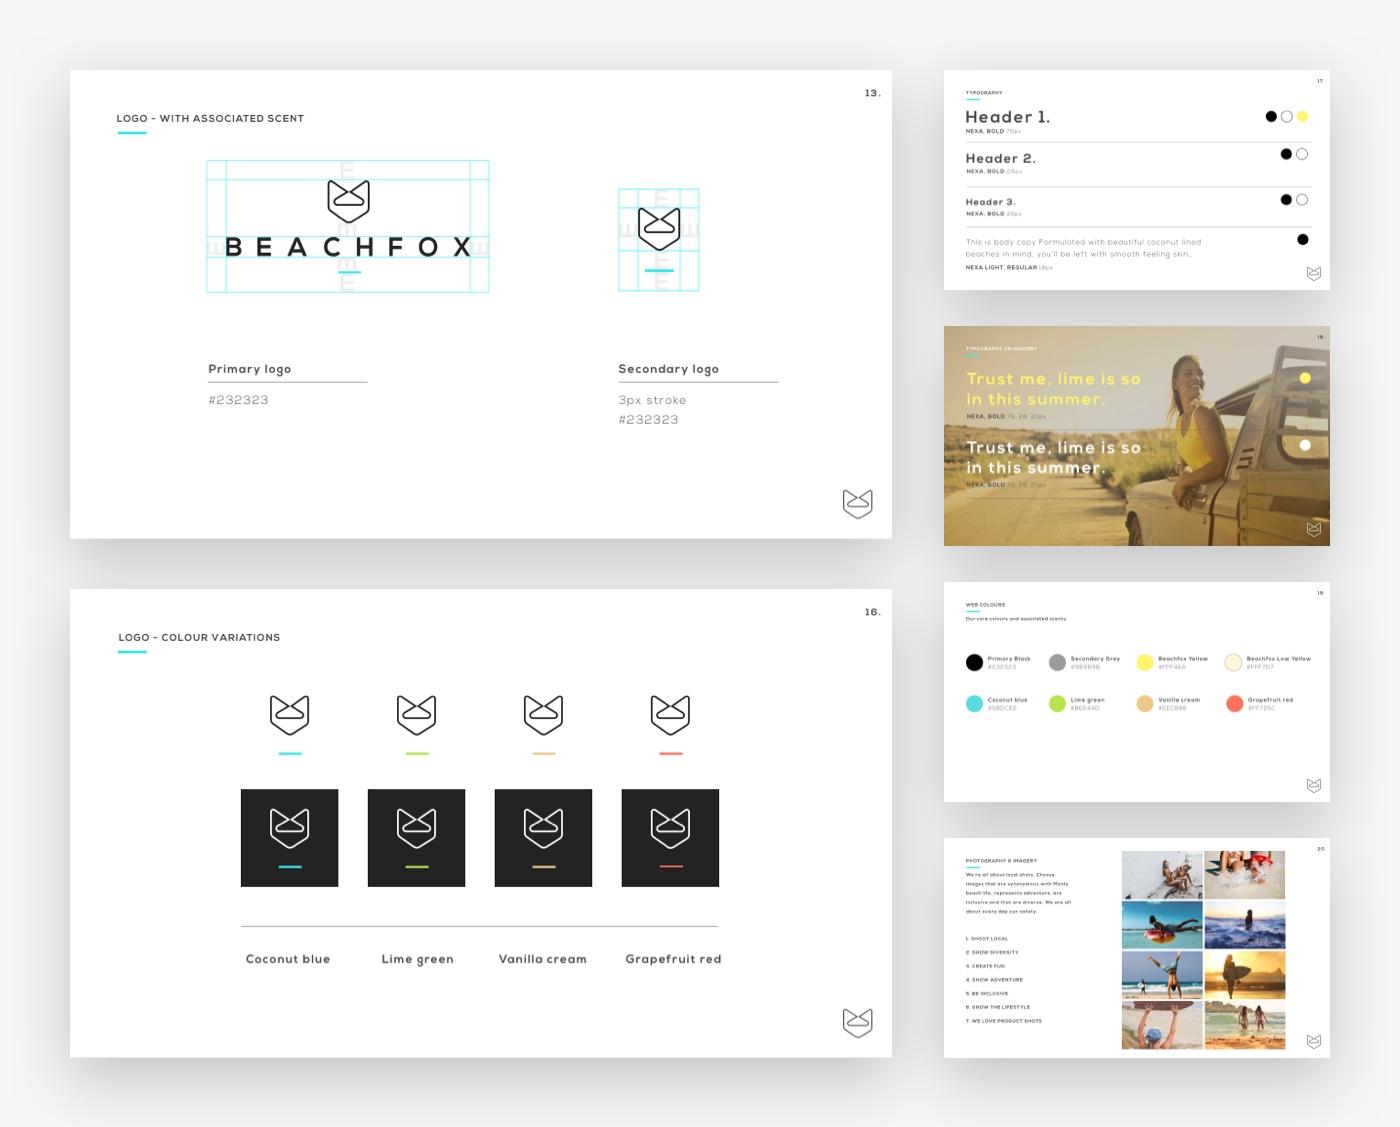 beachfox-brand@1x